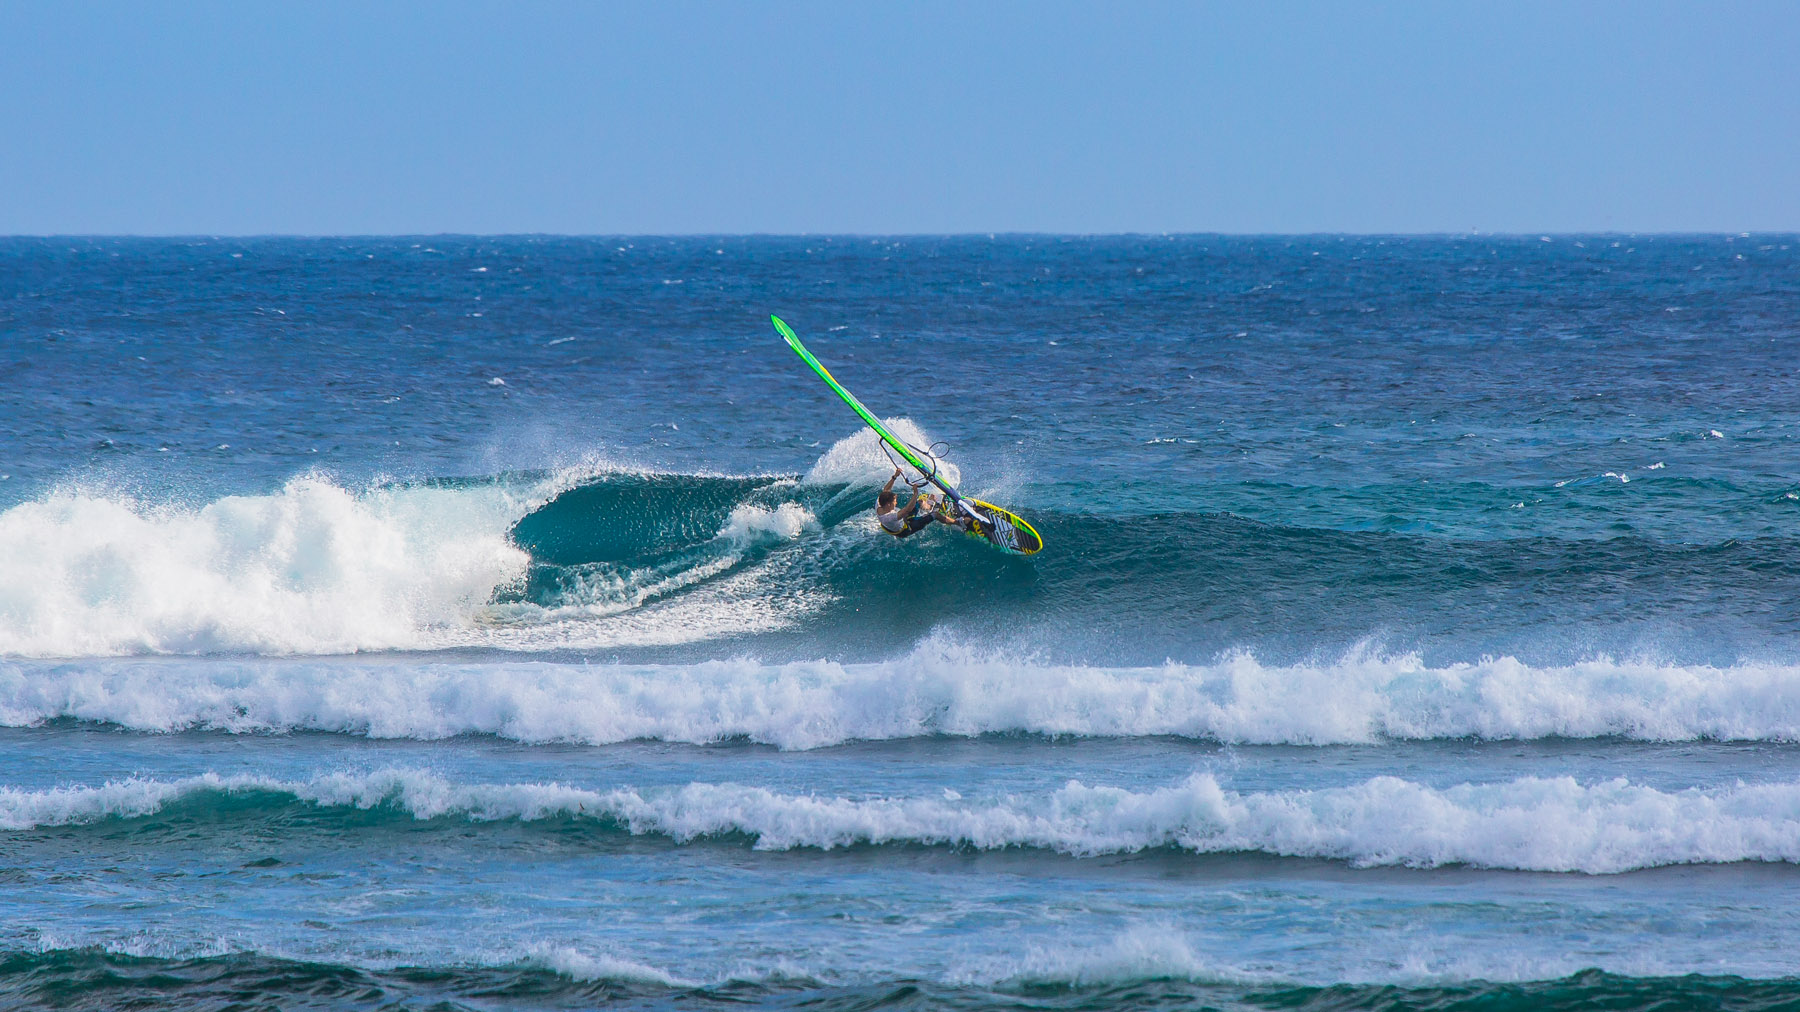 alastair mcleod windsurfing a fun reef break